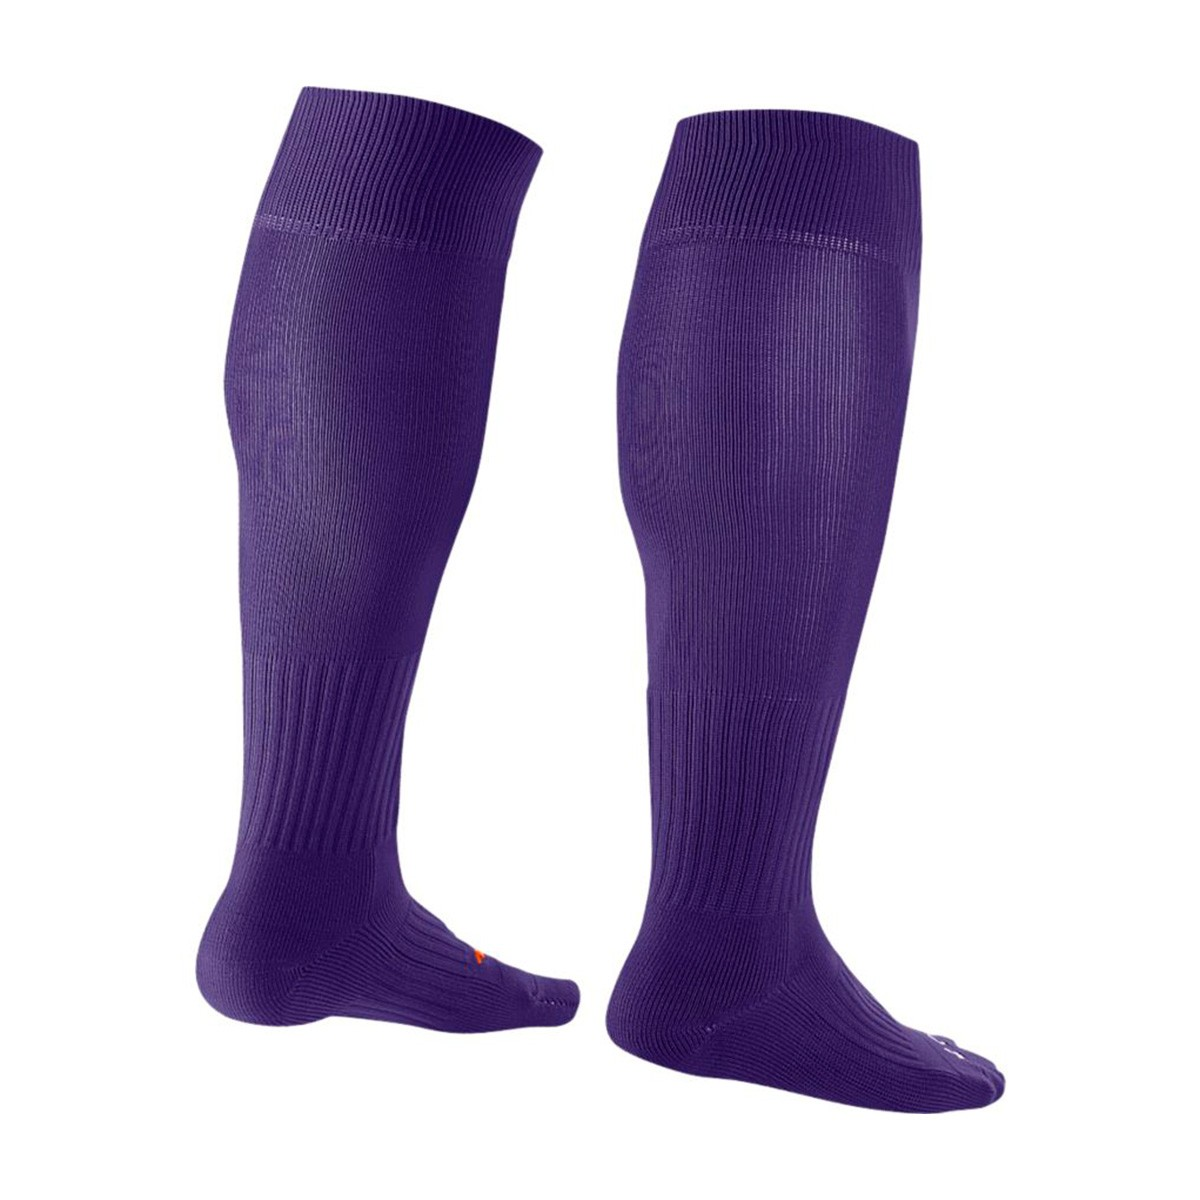 3c5b71b27 Football Socks Nike Classic II Over-the-Calf Court purple-White - Tienda de  fútbol Fútbol Emotion